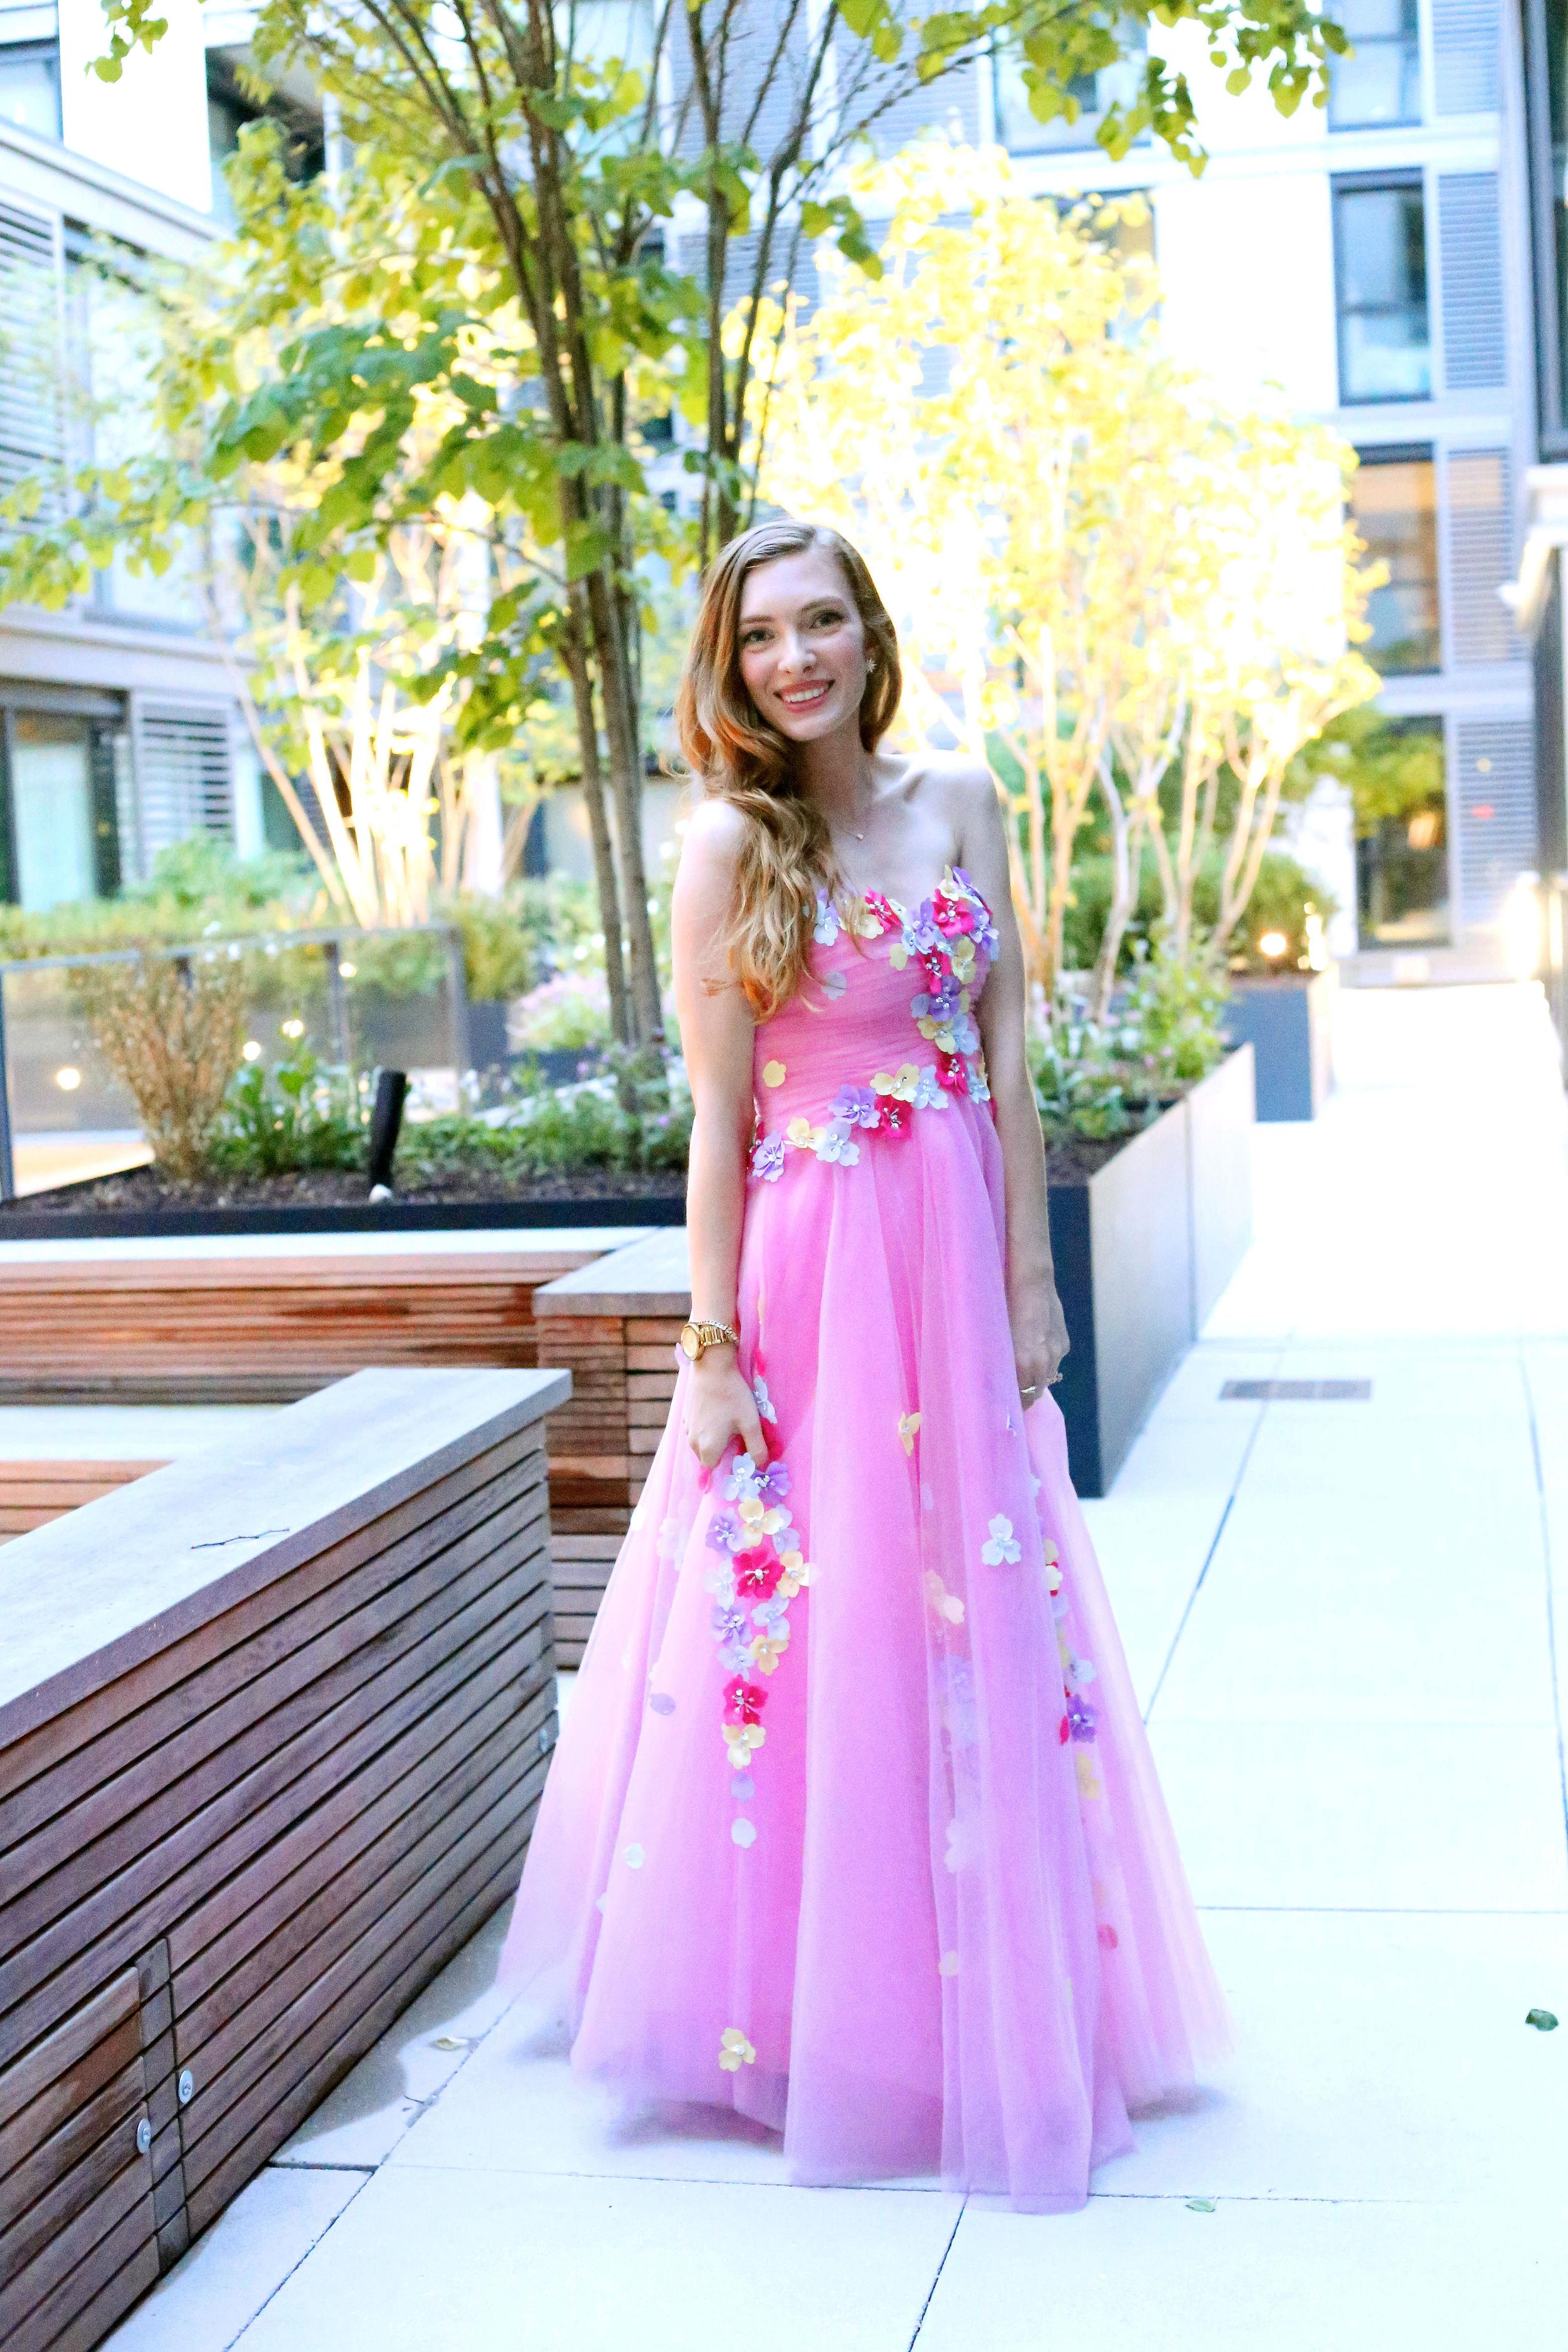 Ball Gown- Enchanting Elegance